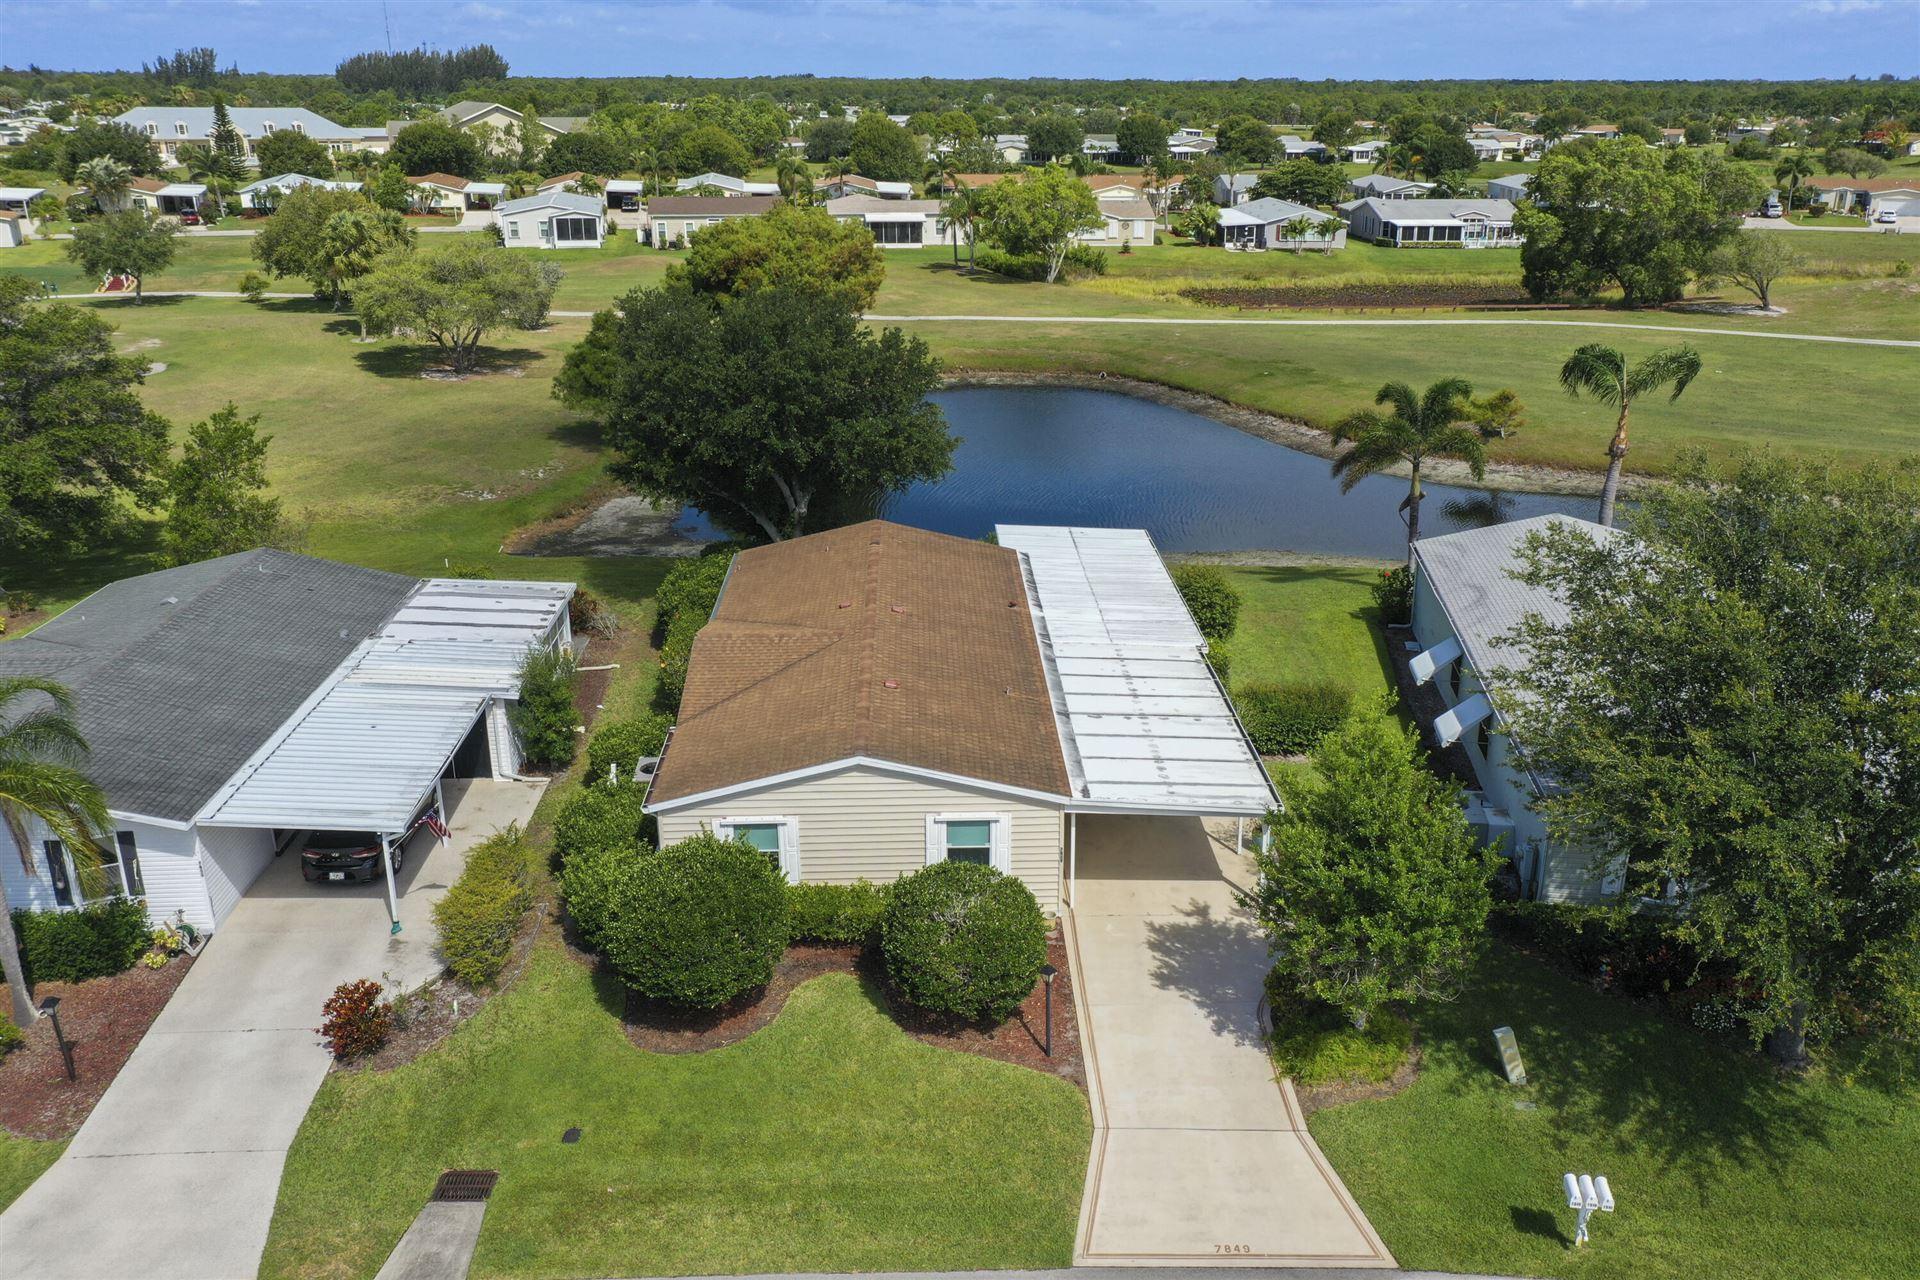 7849 Meadowlark, Port Saint Lucie, FL 34952 - #: RX-10723974